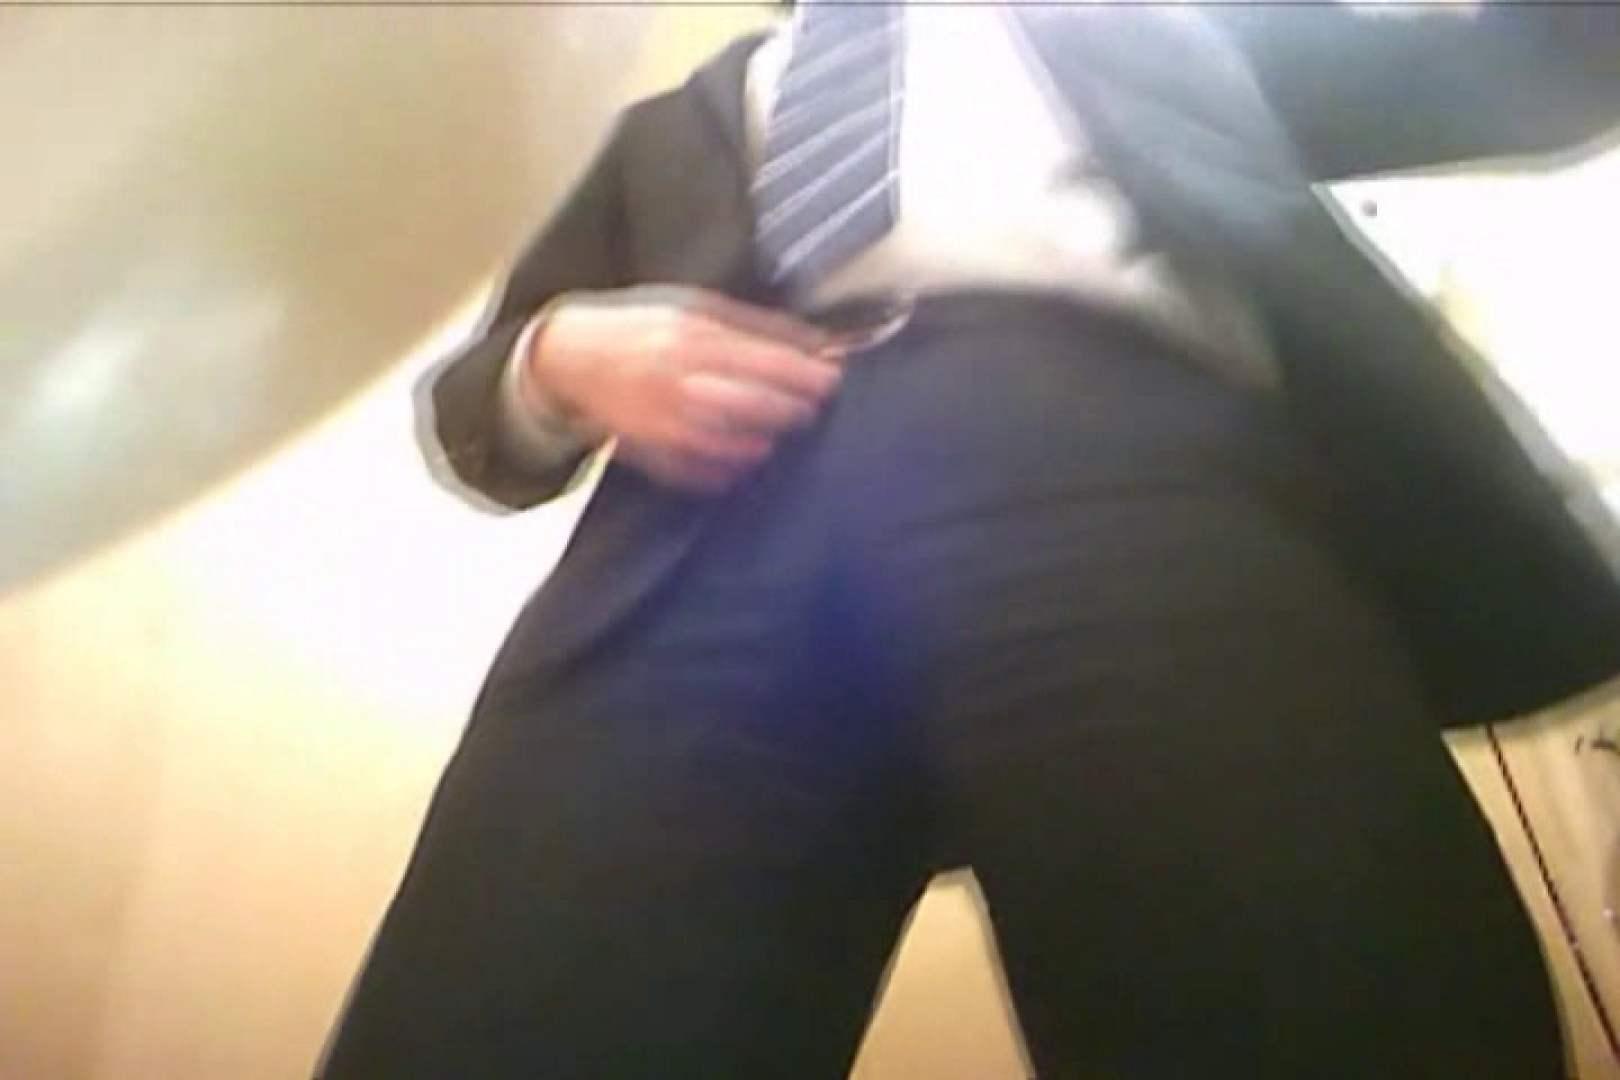 SEASON 2ND!掴み取りさんの洗面所覗き!in新幹線!VOL.06 覗きシーン ゲイ射精画像 87枚 87